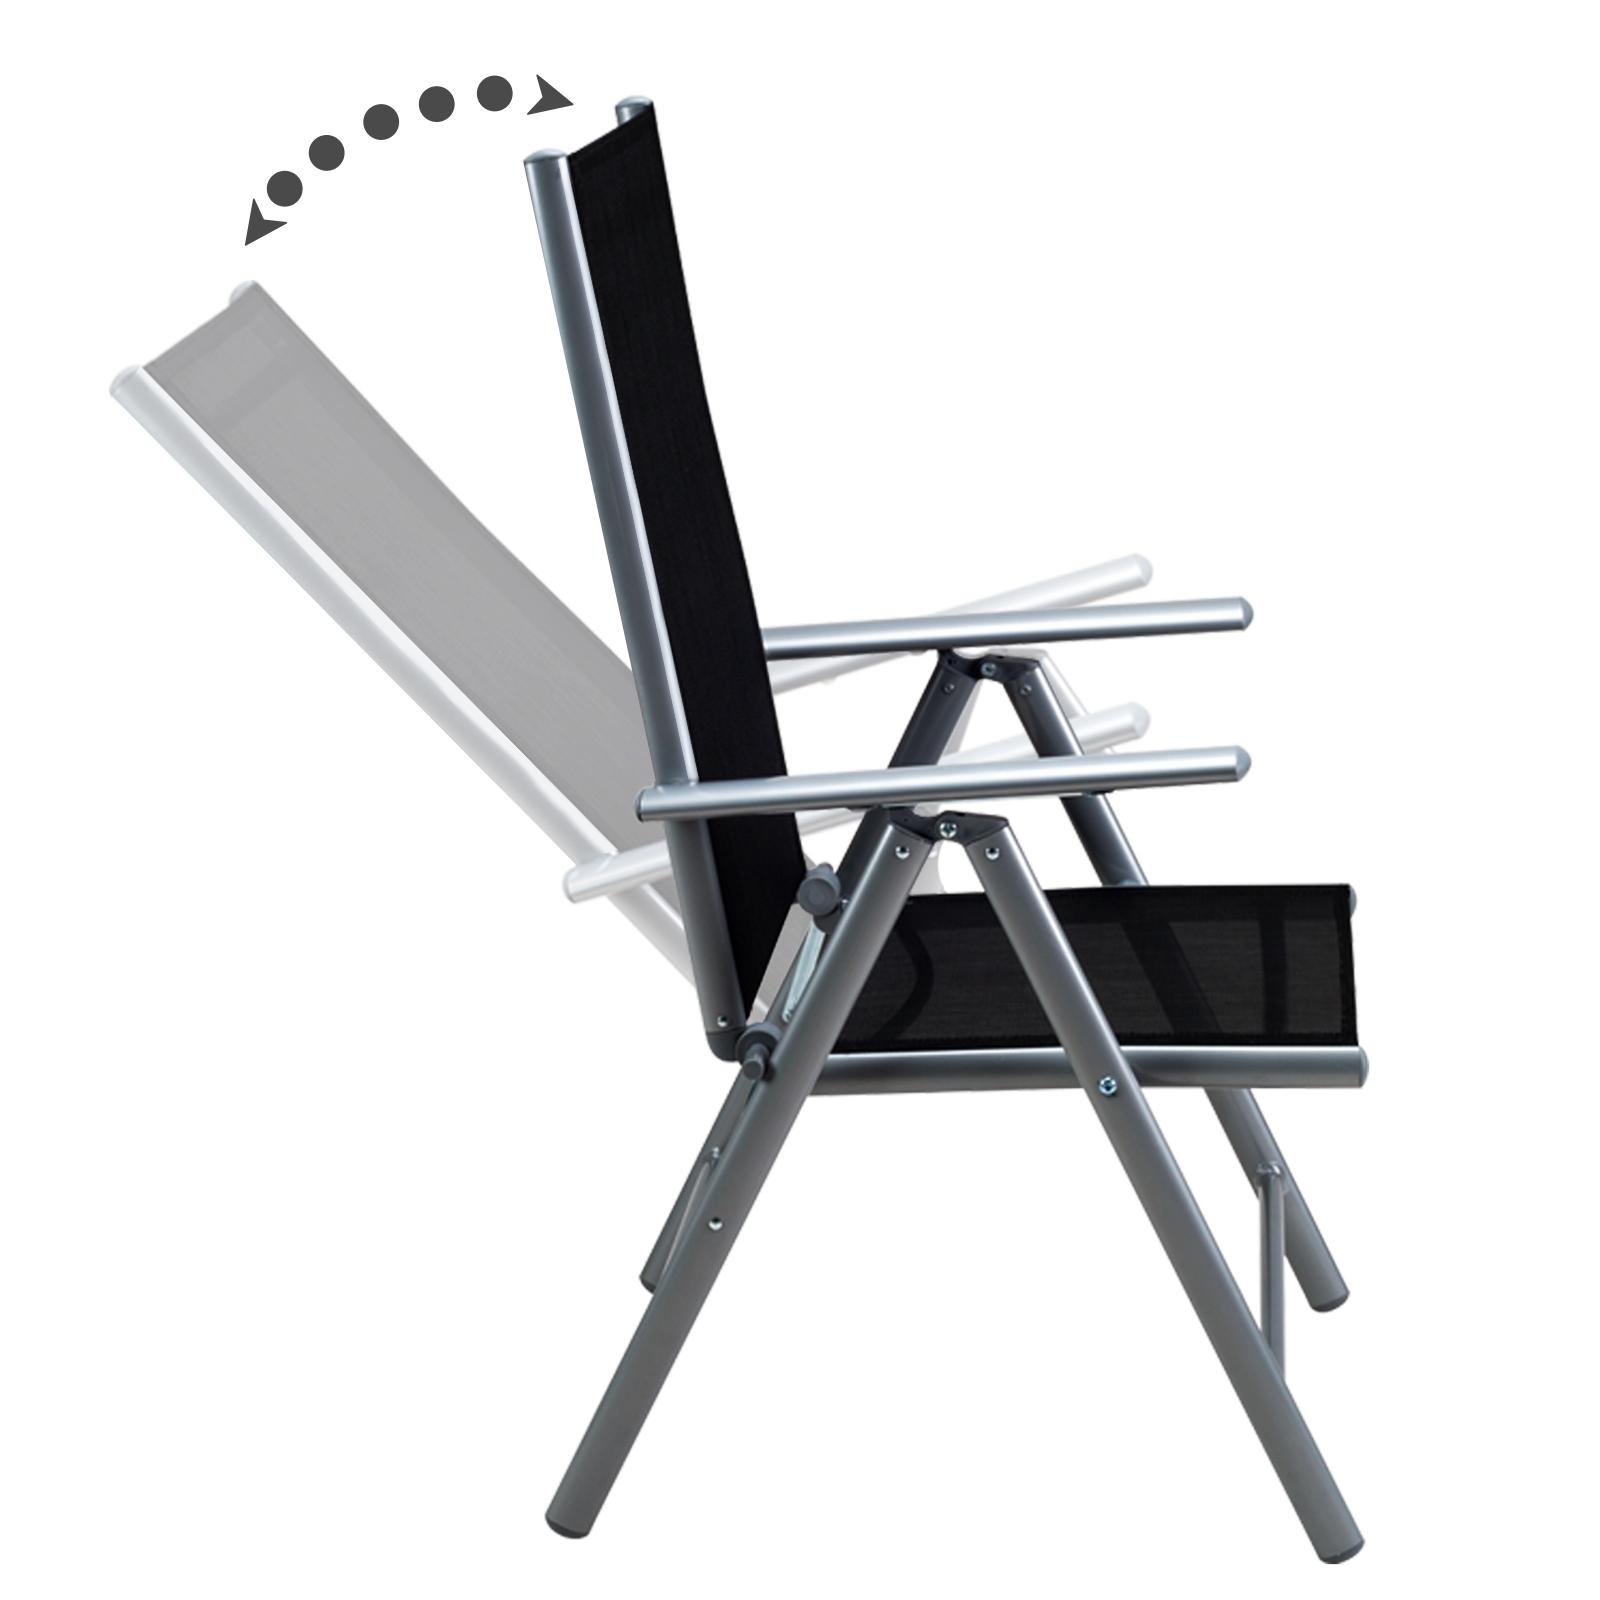 sitzgruppe alu gartenm bel aluminium garten essgruppe tisch klappstuhl set 8 1 ebay